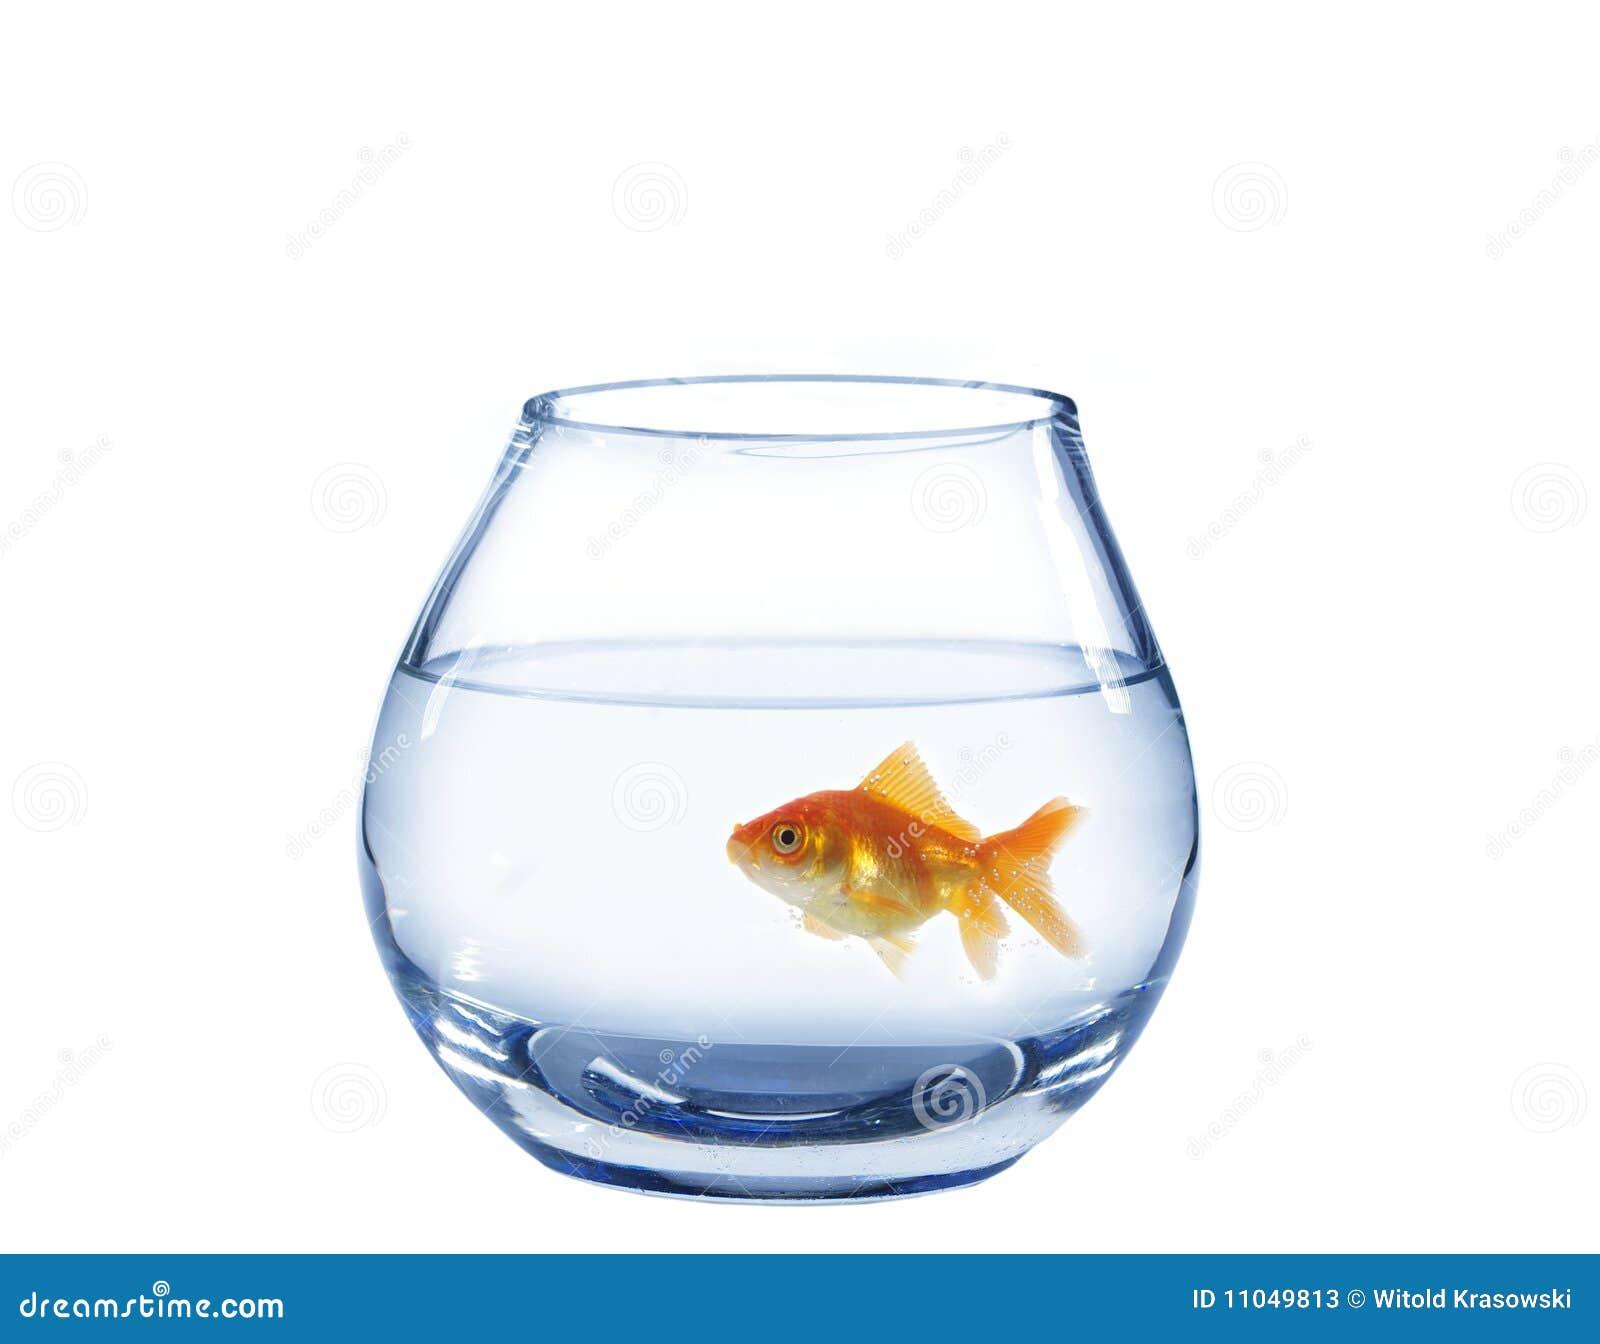 Goldfische im glasaquarium stockbild bild von float for Goldfische im aquarium